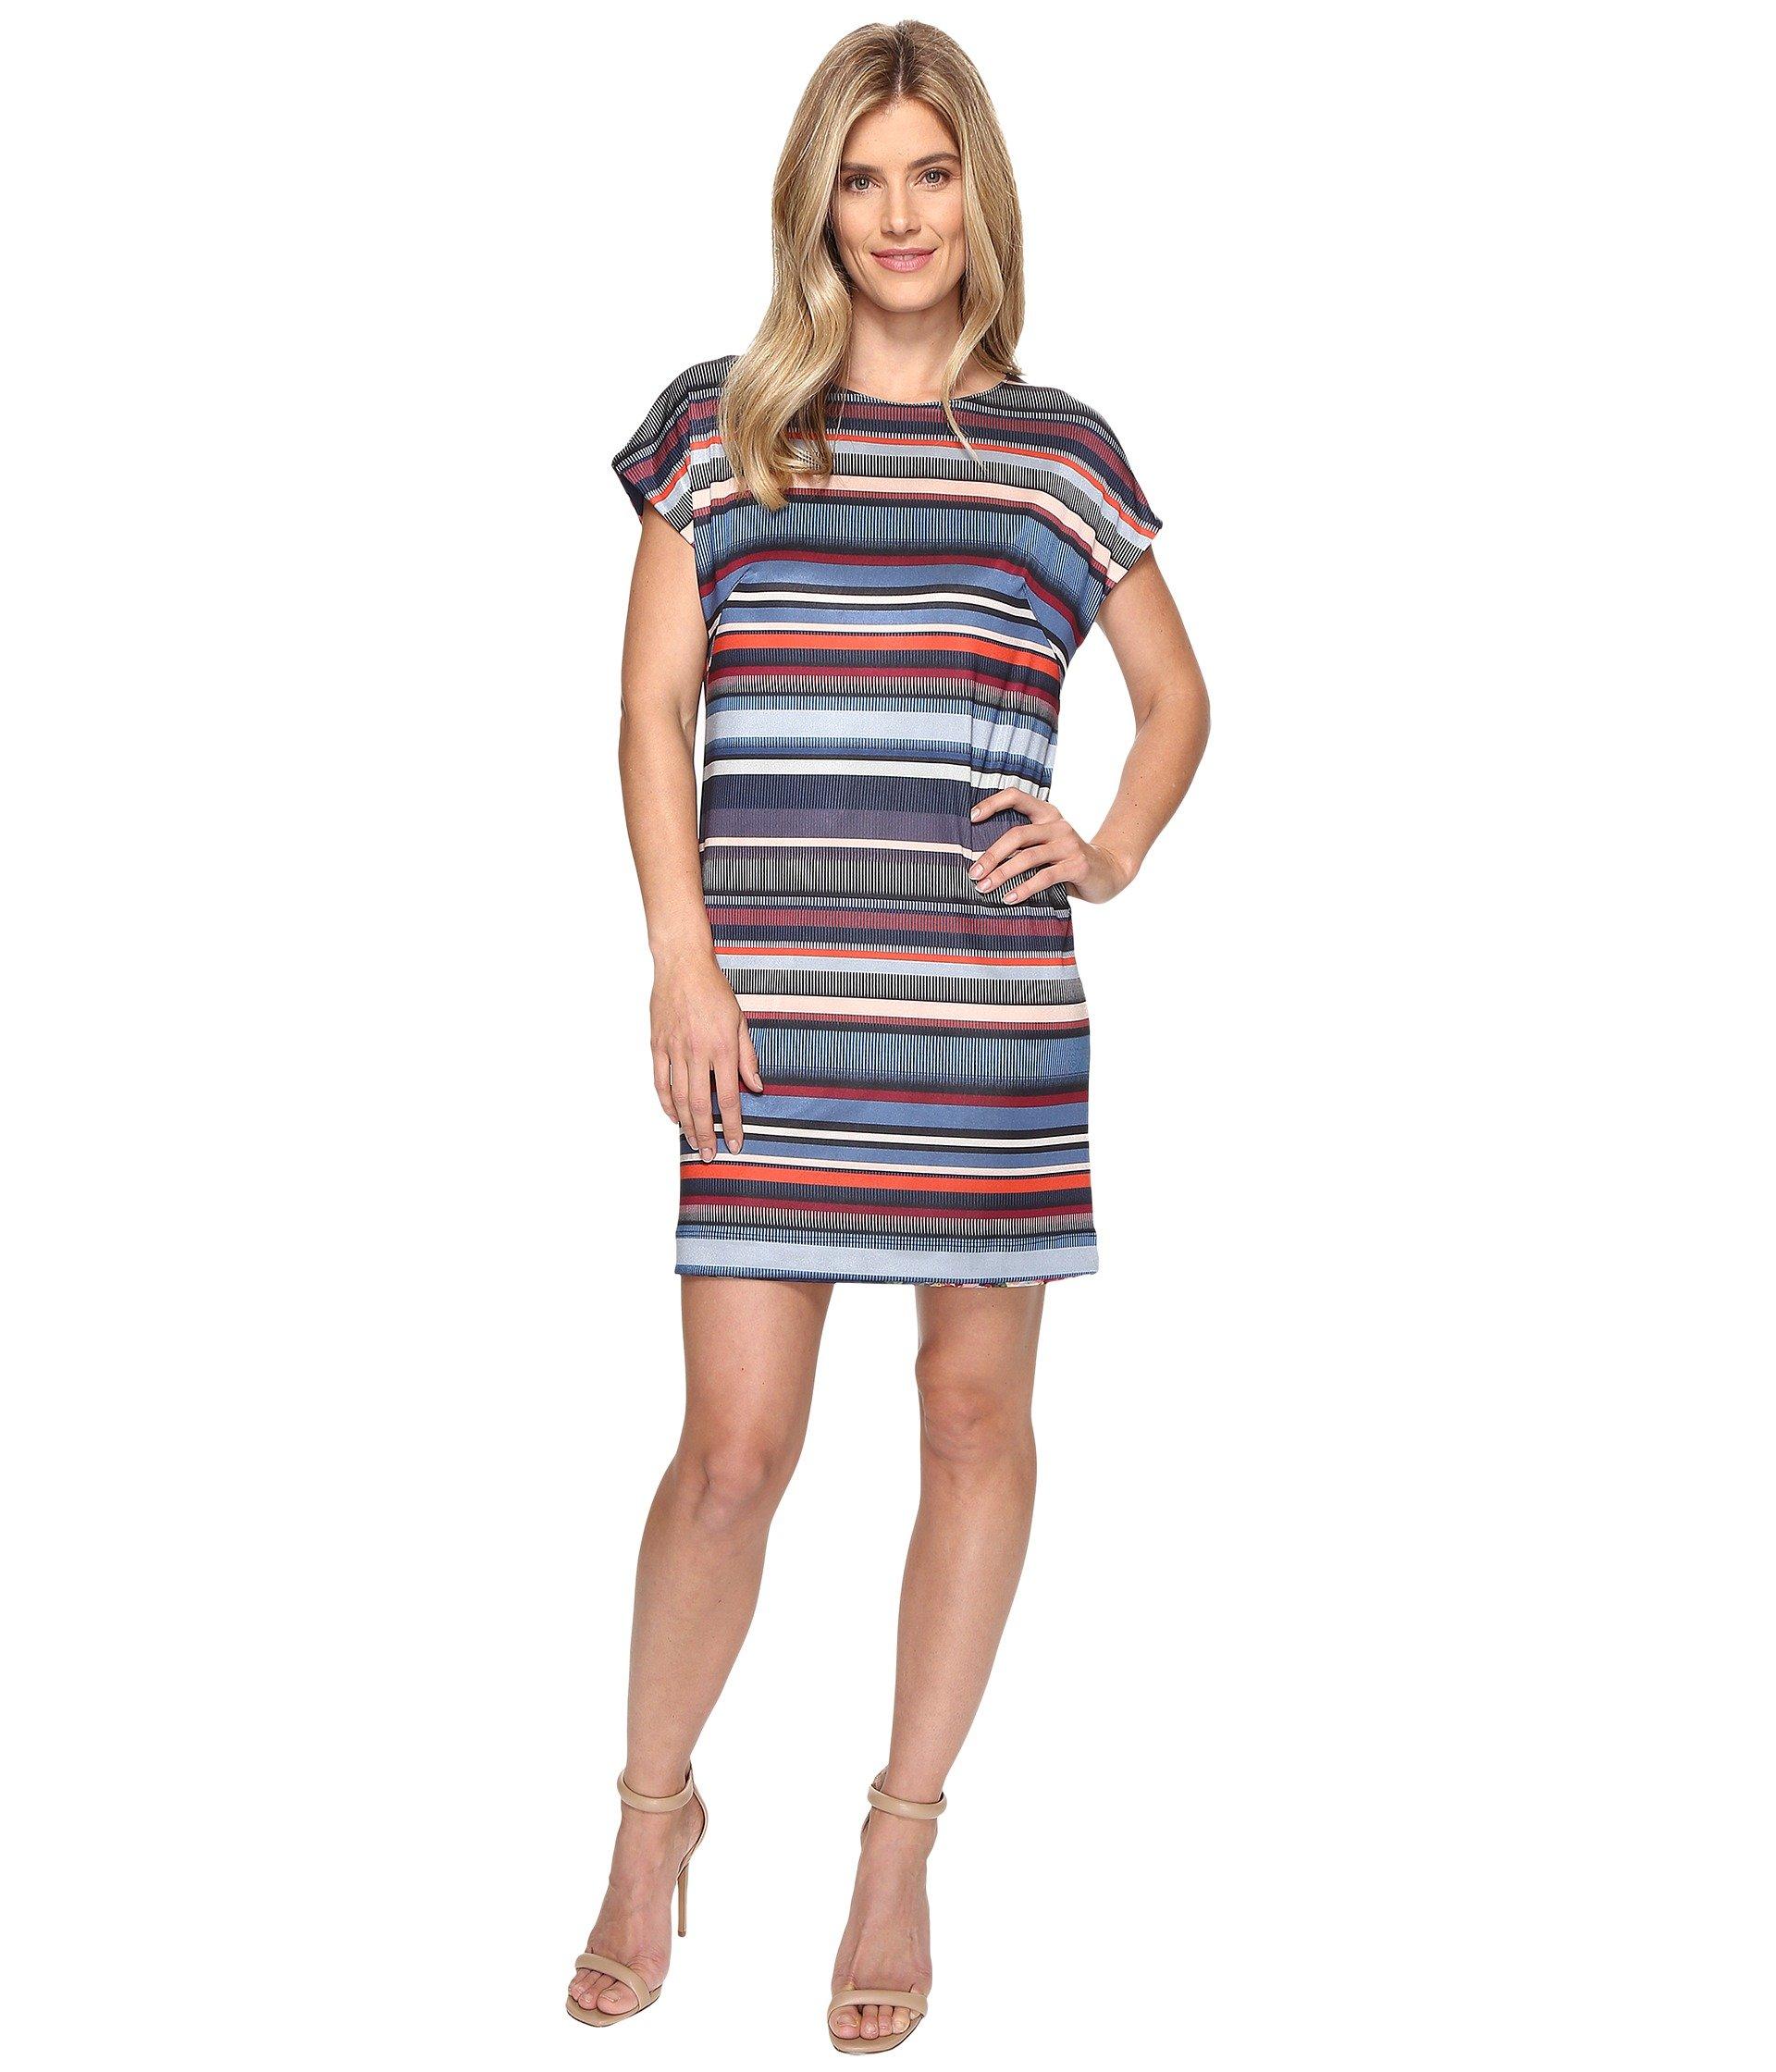 NALLY & MILLIE Reversible Printed Dress, Multi